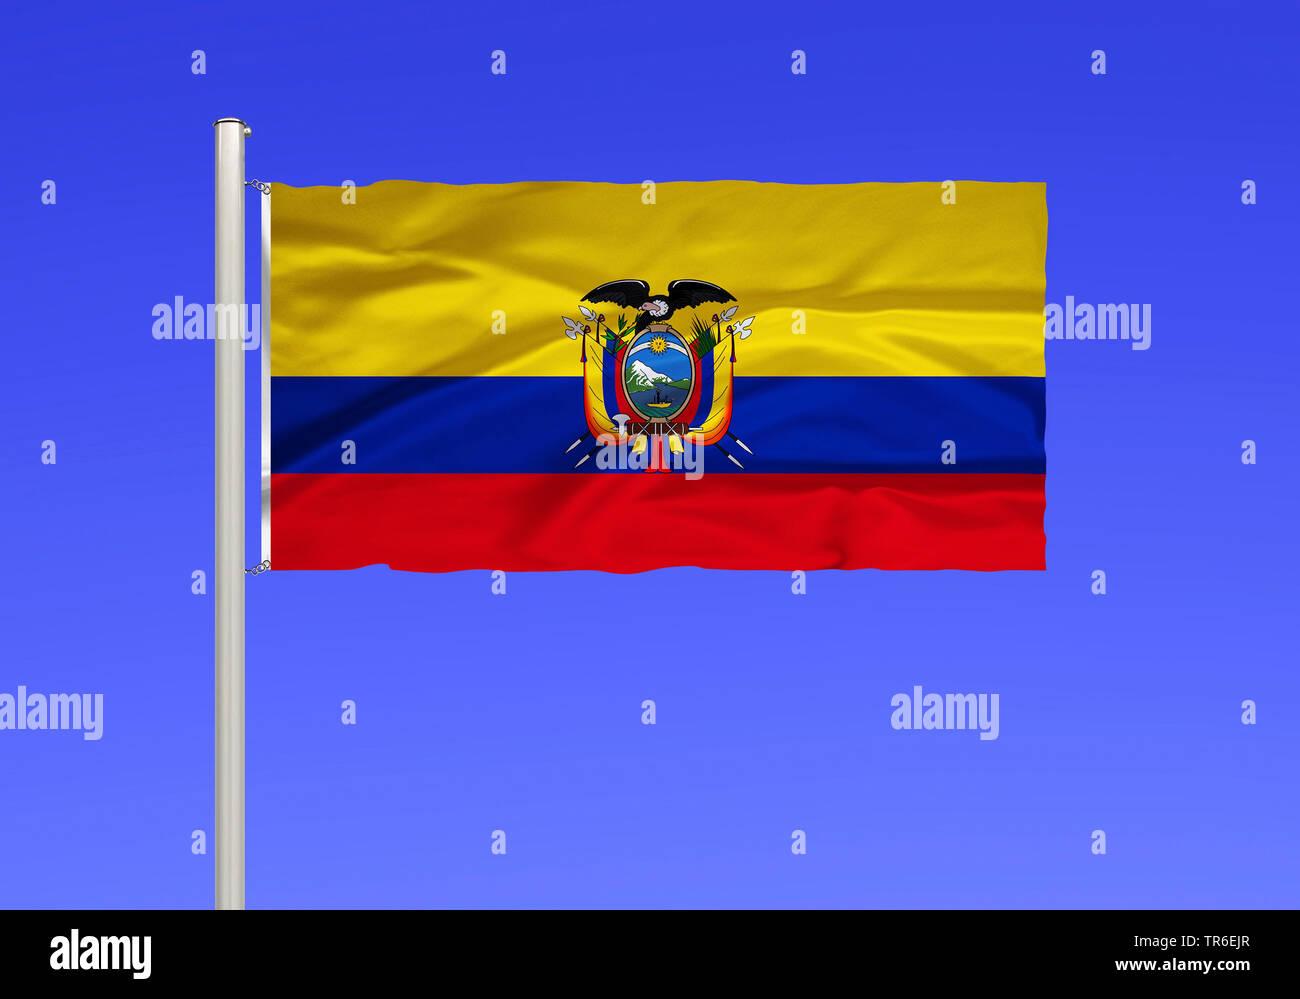 Flagge von Ecuador vor blauem Himmel, Ecuador | flag of Ecuador against blue sky, Ecuador | BLWS482140.jpg [ (c) blickwinkel/McPHOTO/K. Steinkamp Tel. - Stock Image